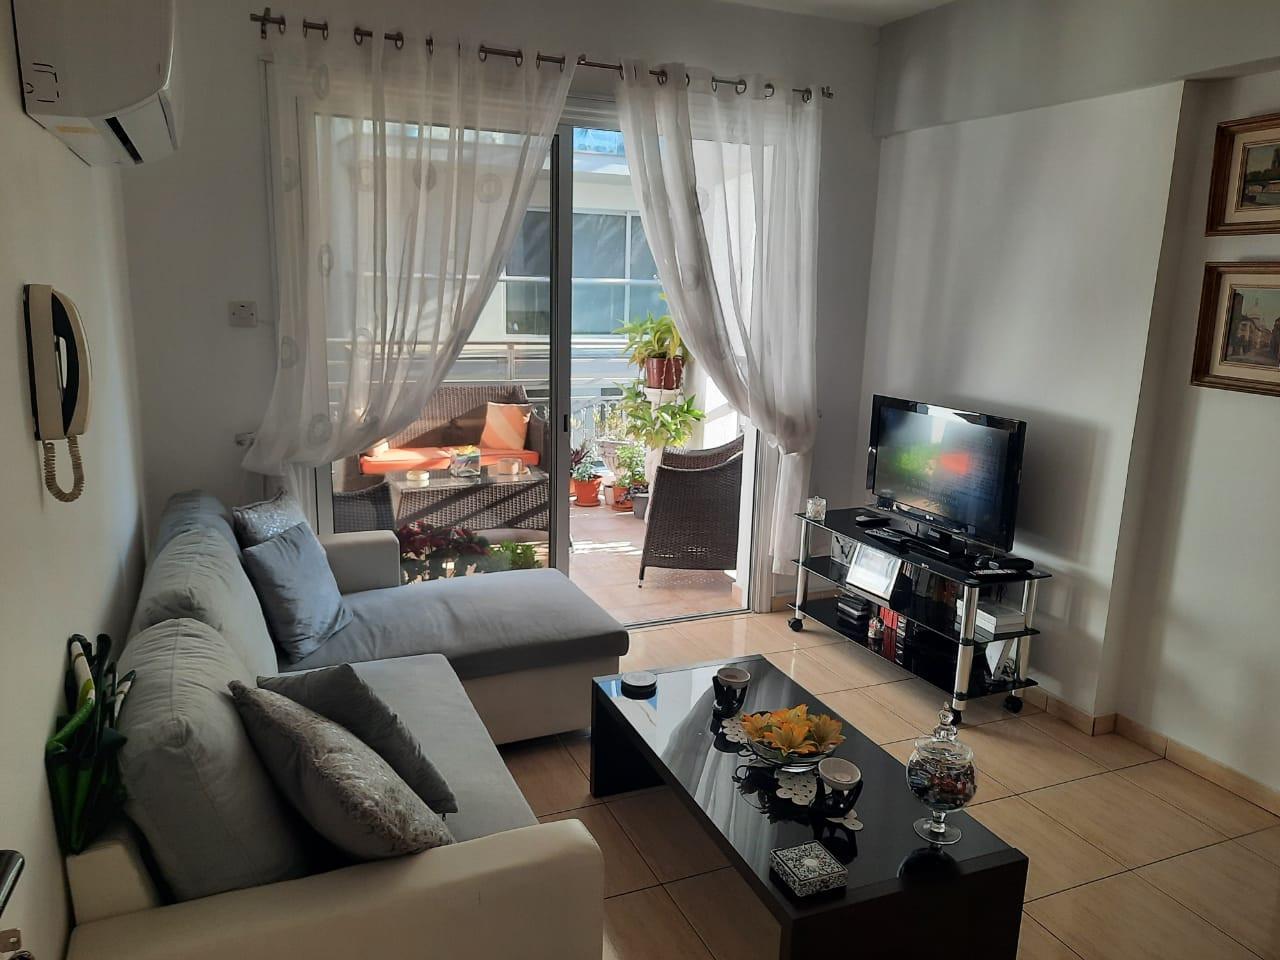 FC-33497: Apartment (Flat) in Mackenzie, Larnaca for Sale - #3